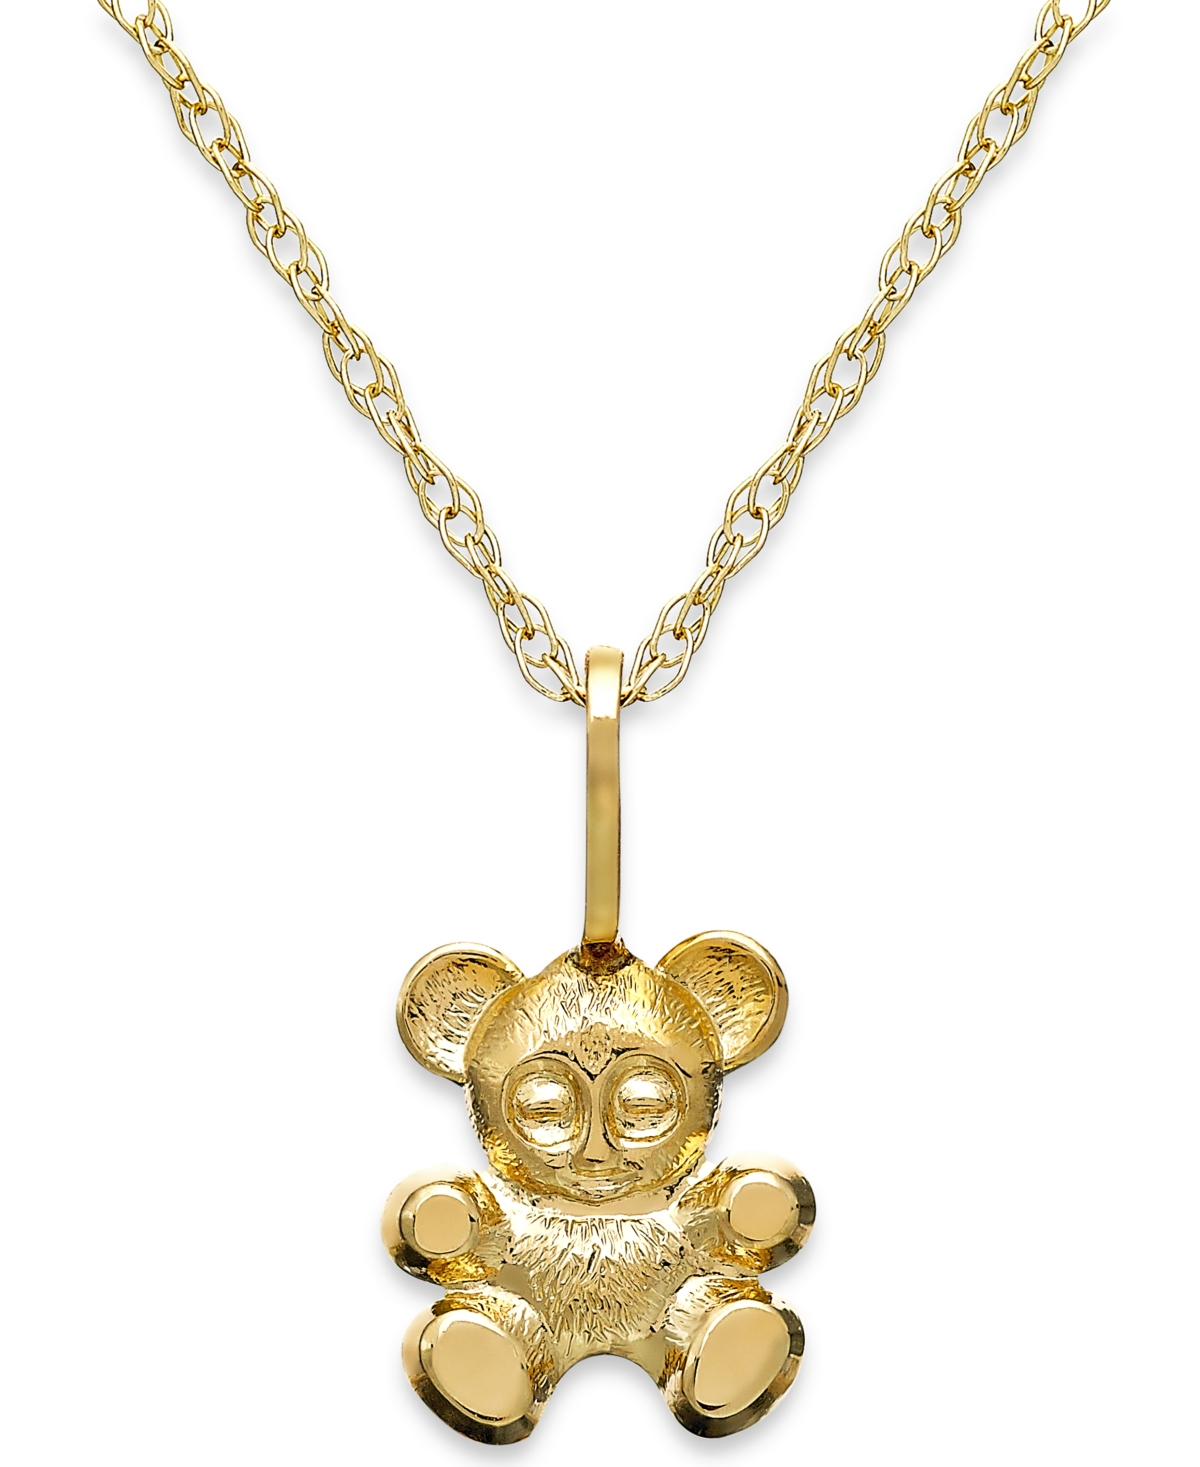 Children's Teddy Bear Teddy Bear Pendant Necklace in 14k Gold